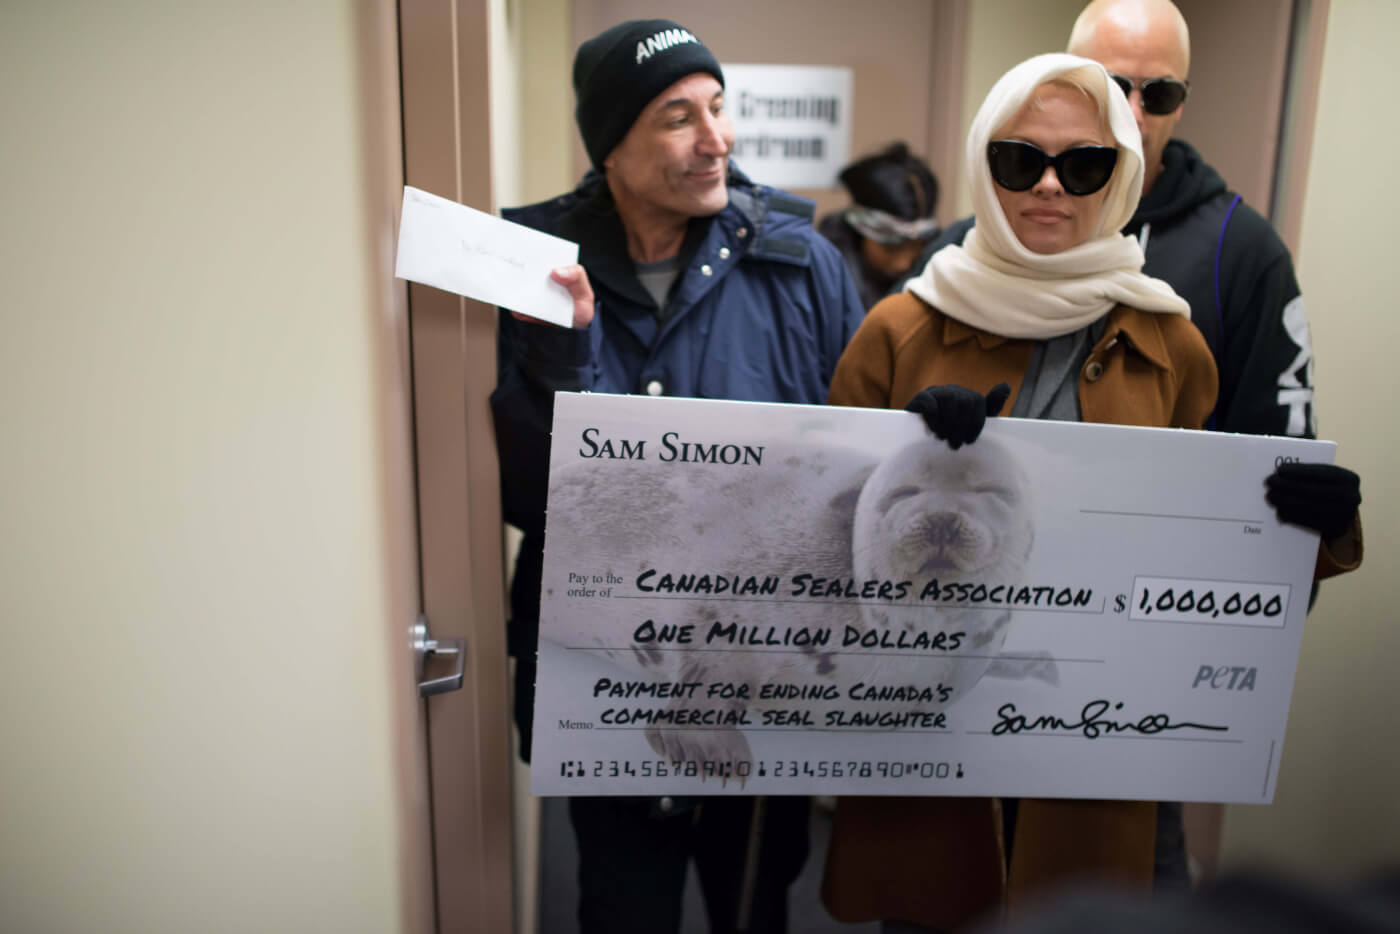 Pam Anderson, Sam Simon Visit Sealers With Million-Dollar